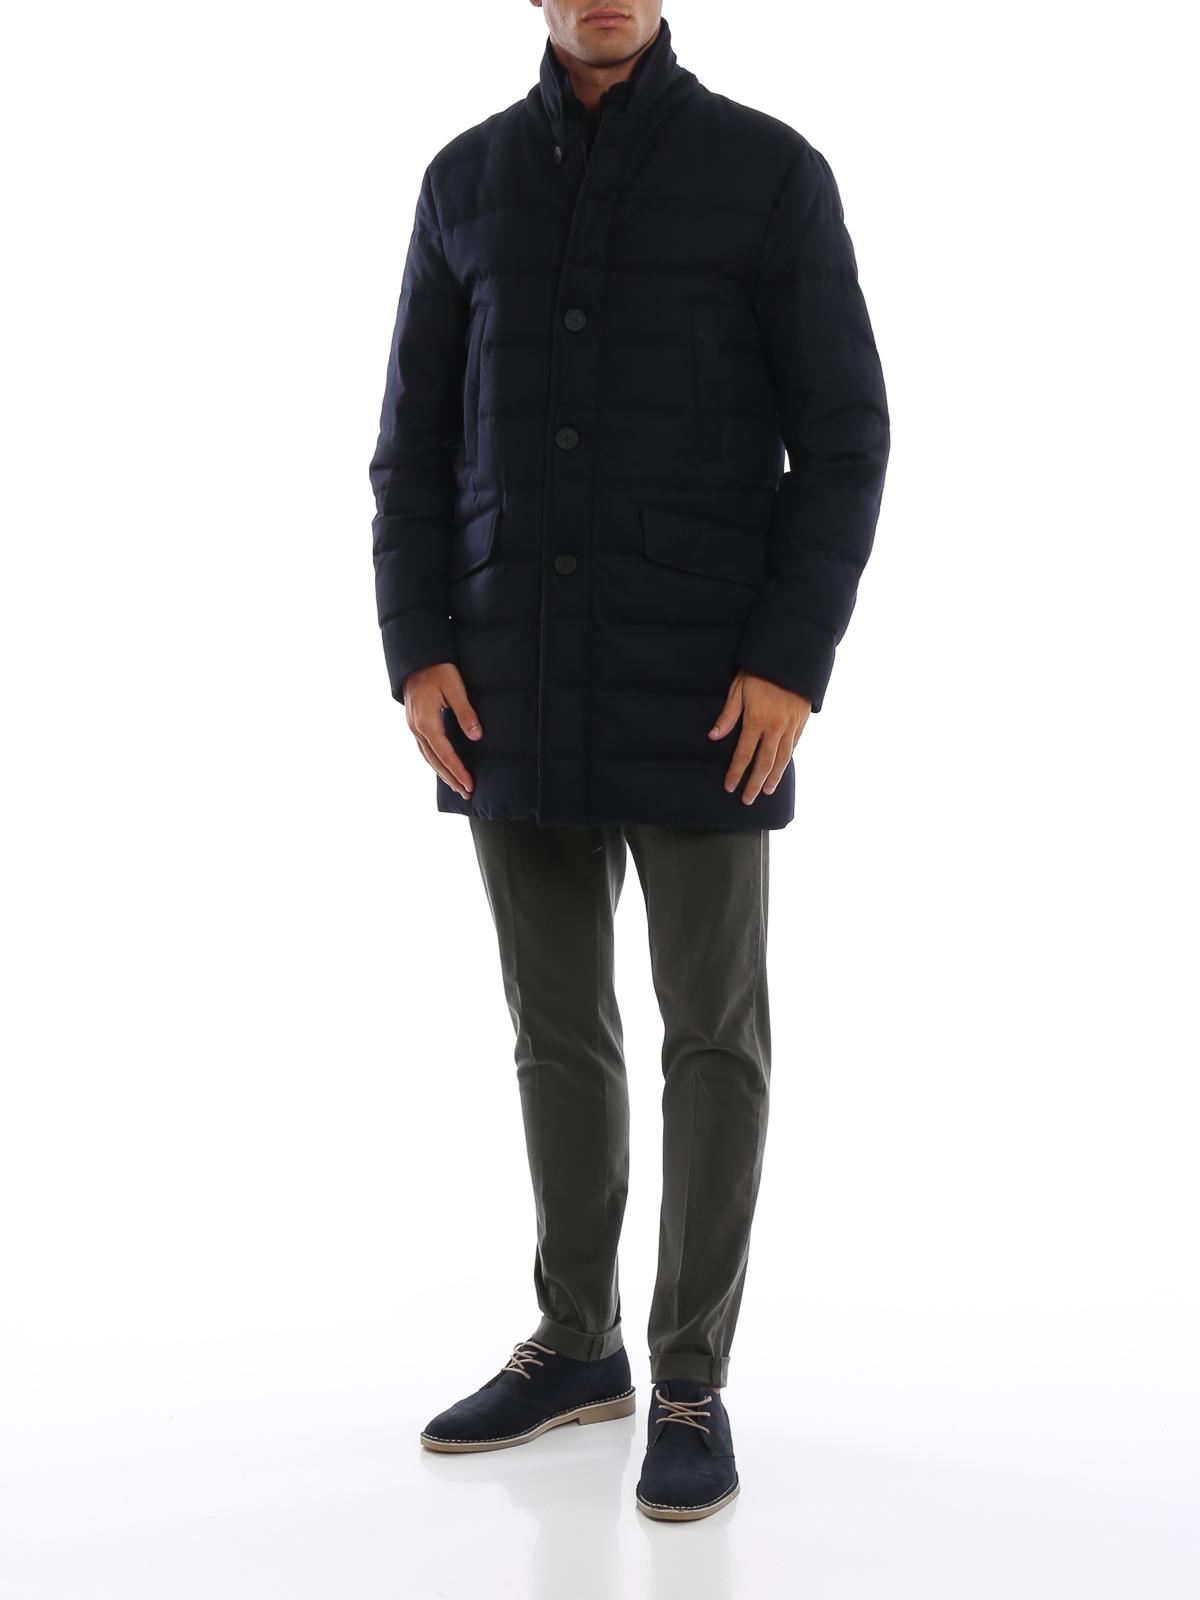 5256912a5 Moncler - Keid dark blue wool twill puffer coat - padded coats - D2 ...